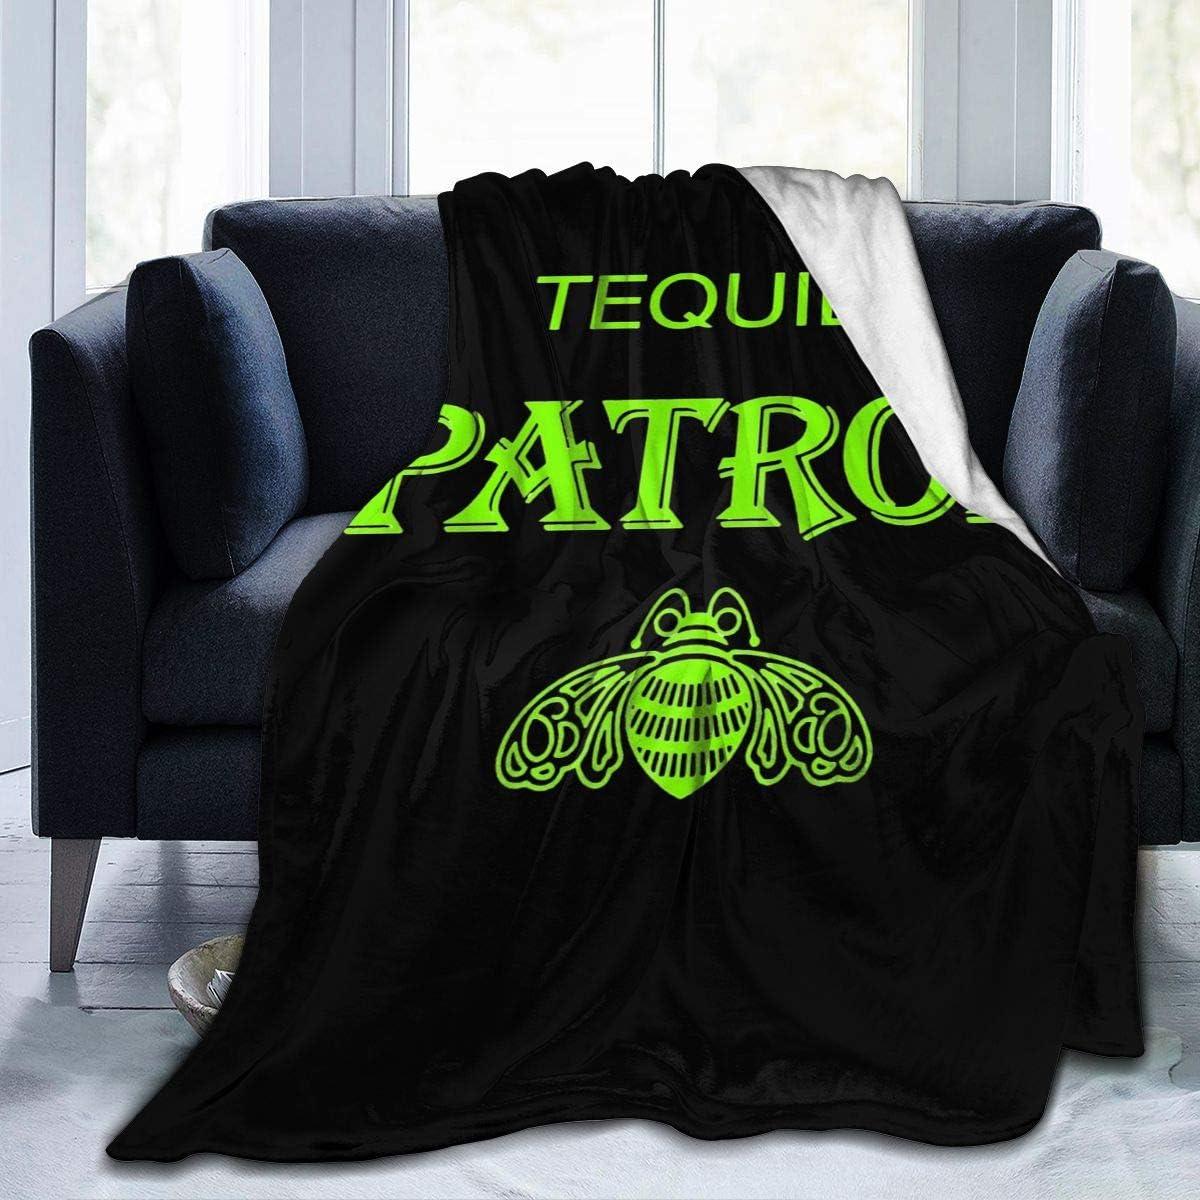 NOT Patron Tequila Logo Micro Fleece Blanket Max 88% OFF Ultra-Soft Las Vegas Mall